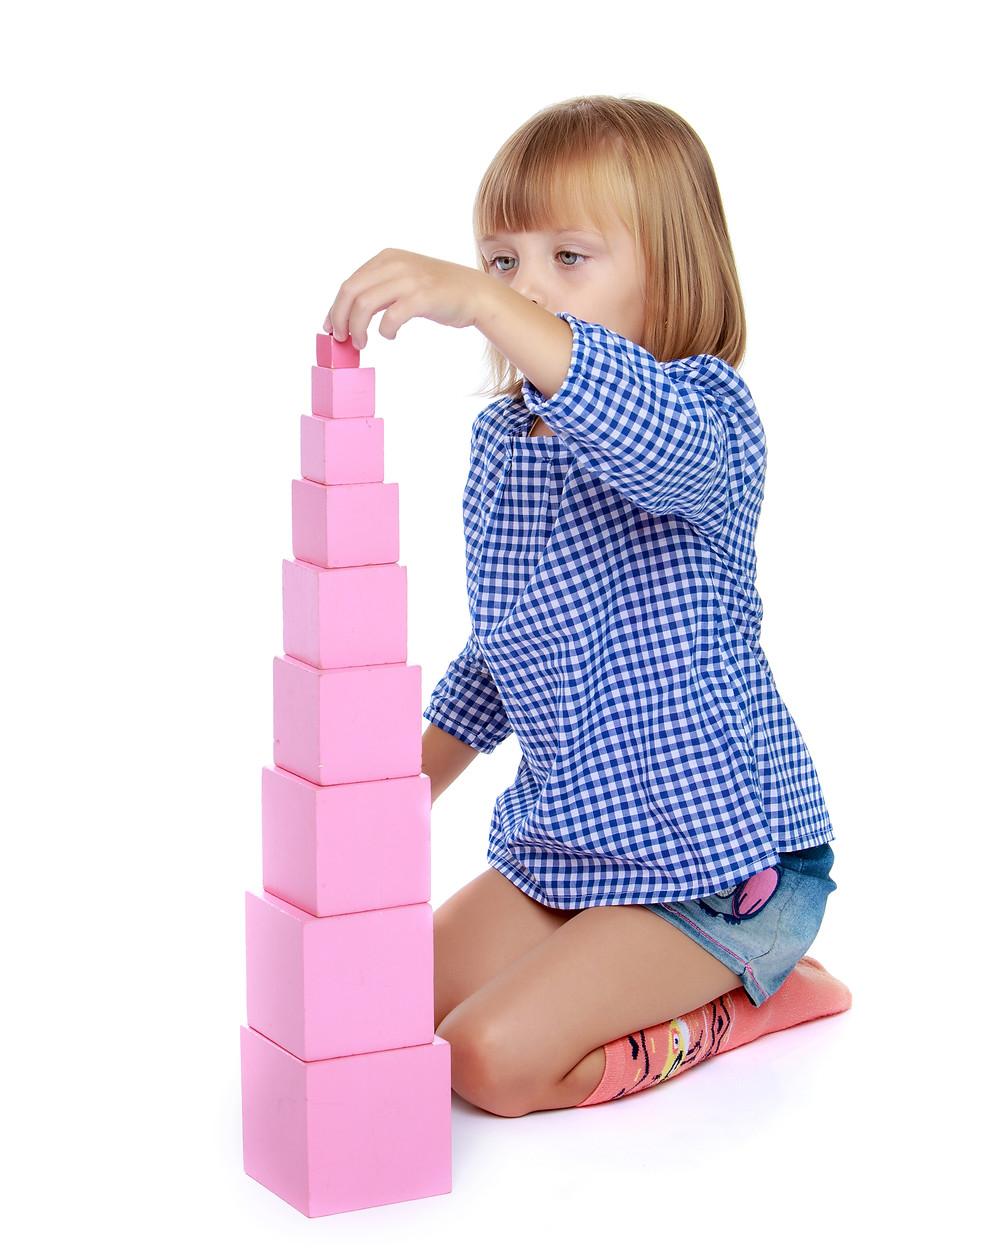 Genuine Montessori Child Care Available Between Reedy Creek & Robina